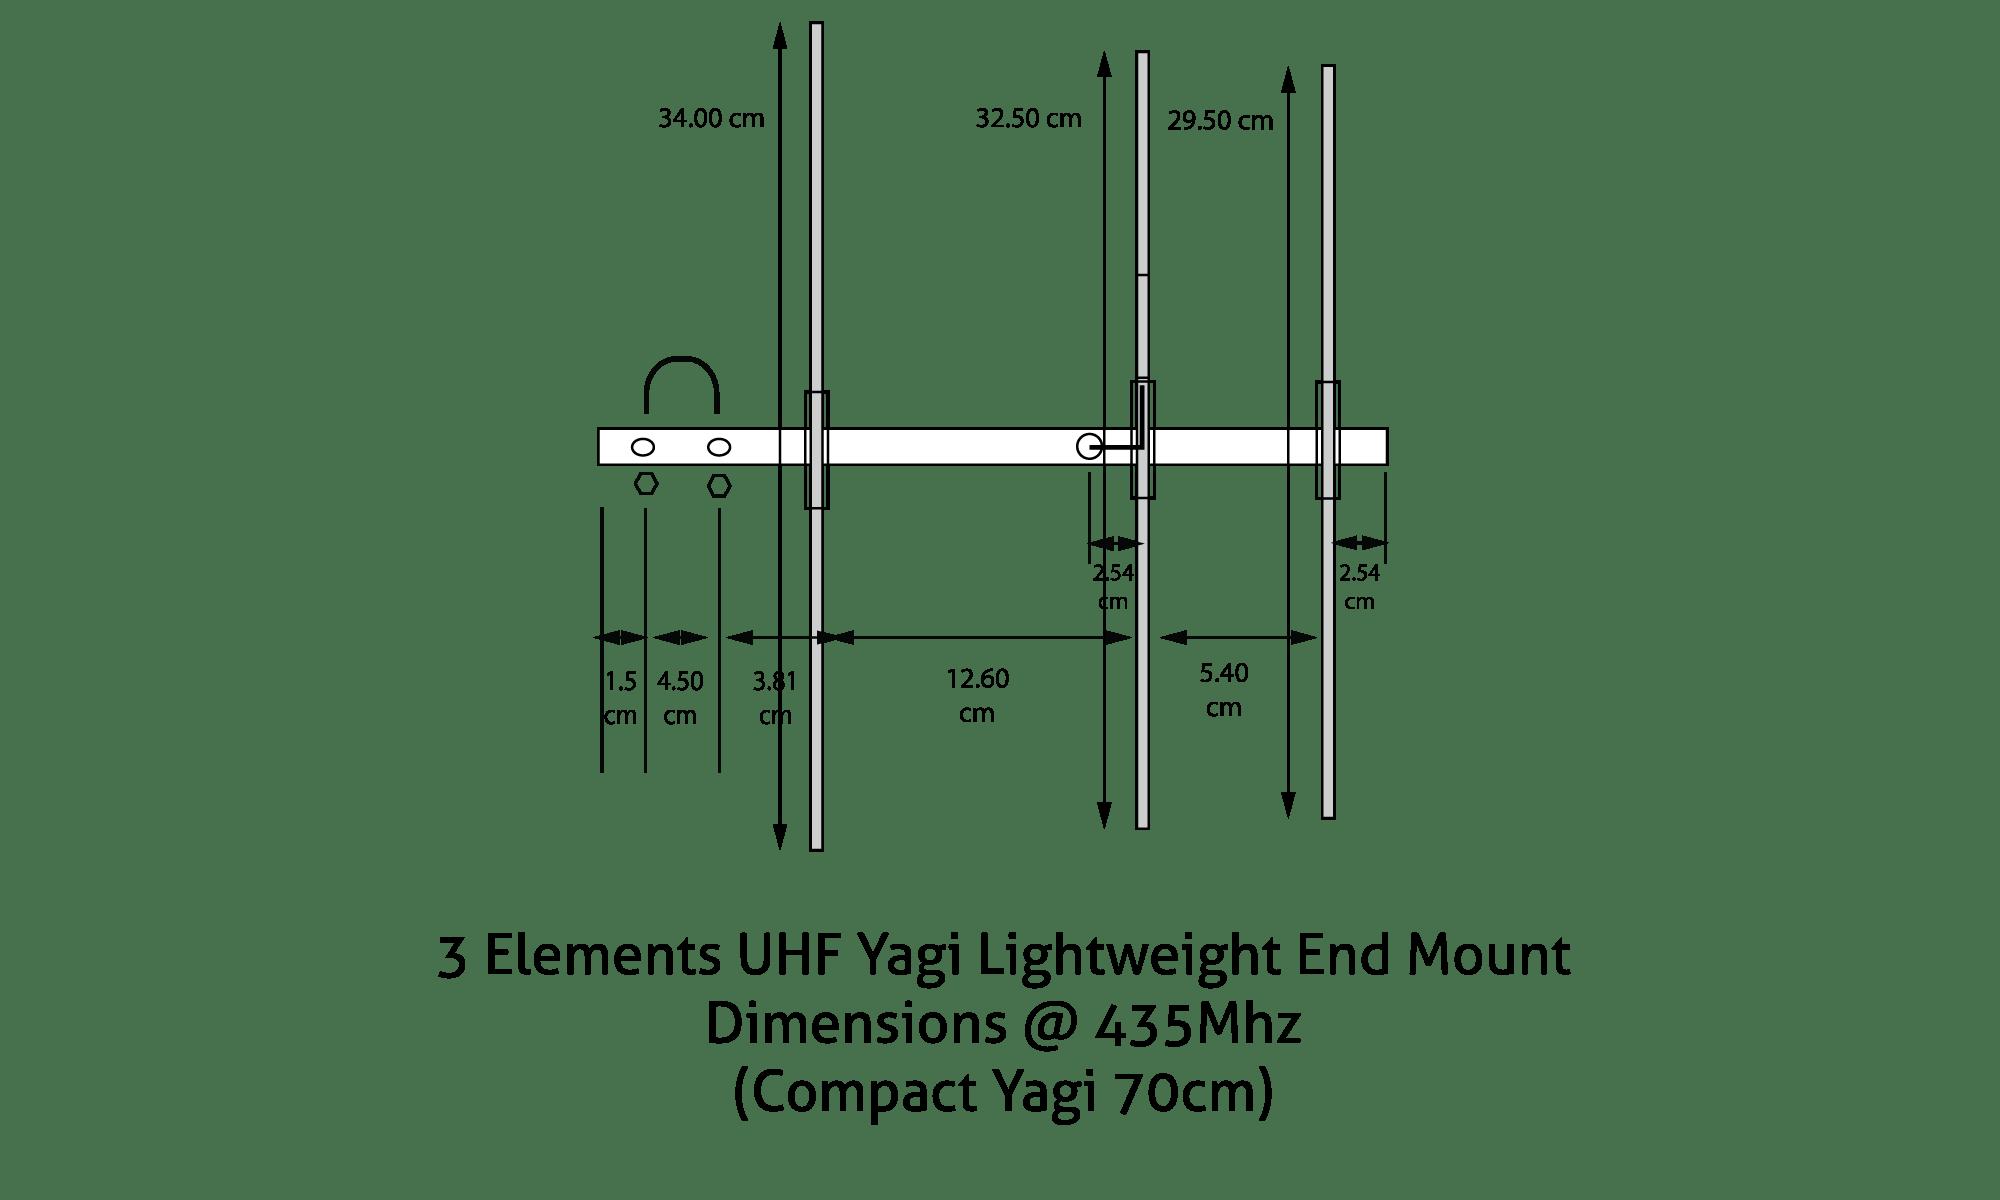 3 Elements Yagi Compact